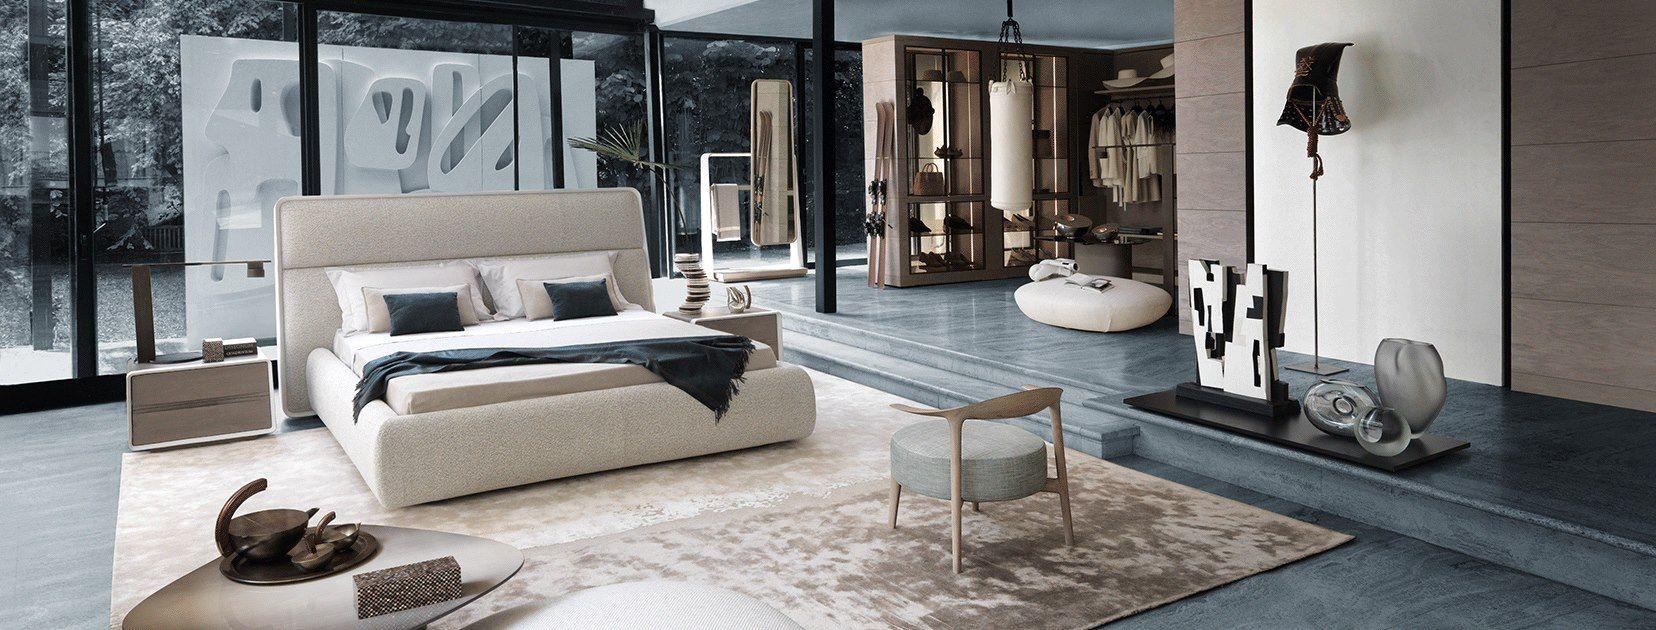 Top 10 Italian Furniture Brands Interni Design Mobili